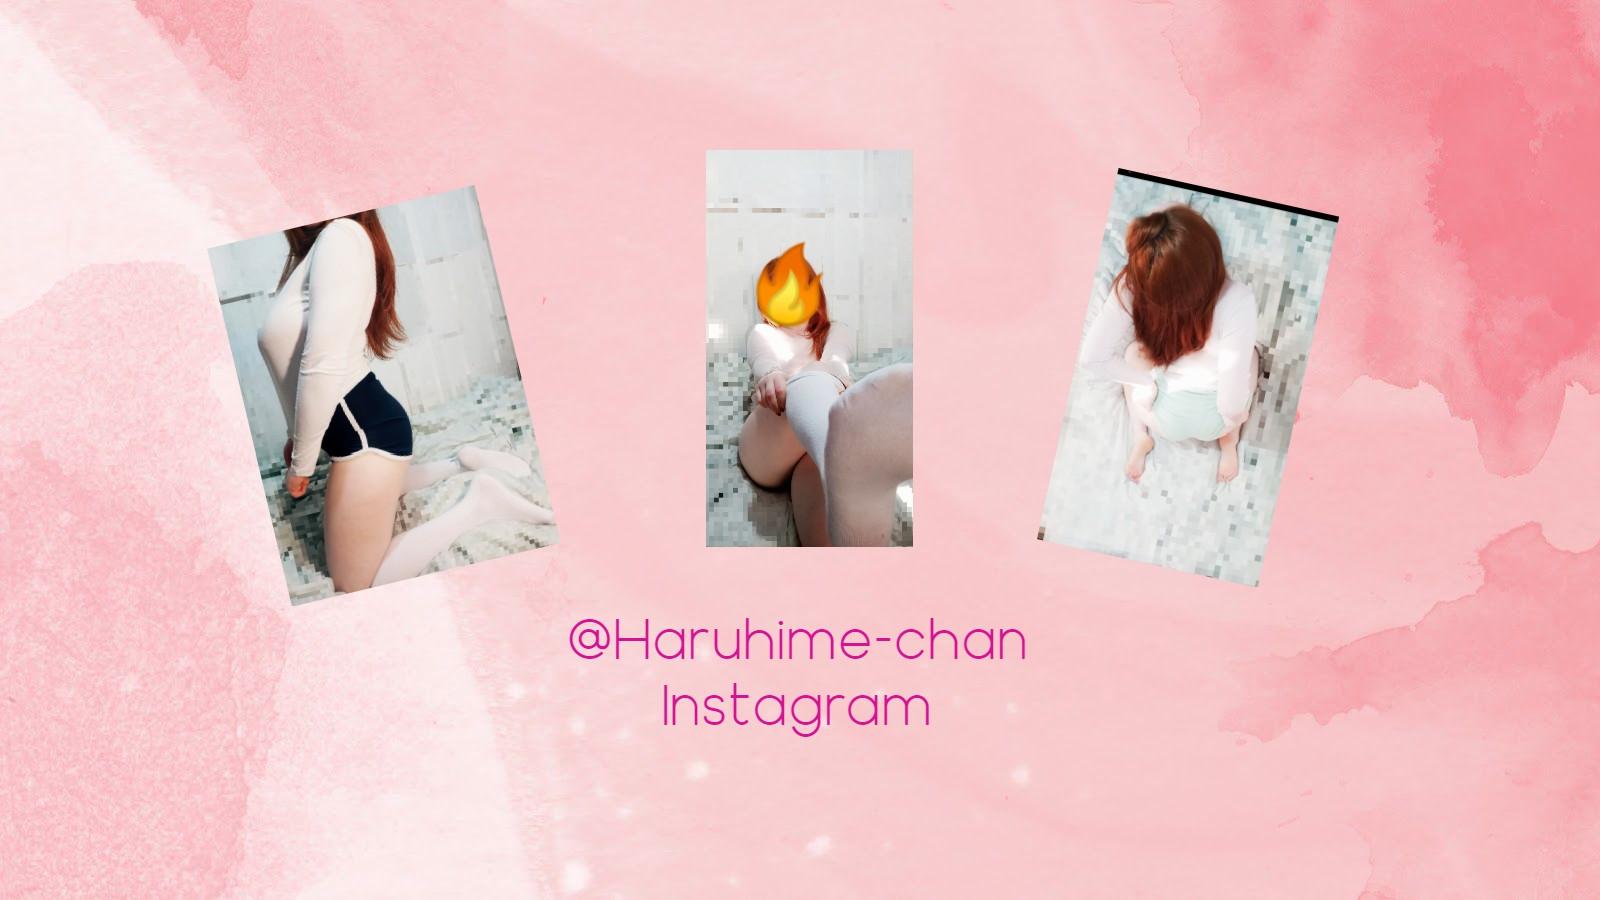 Haruhime_chan